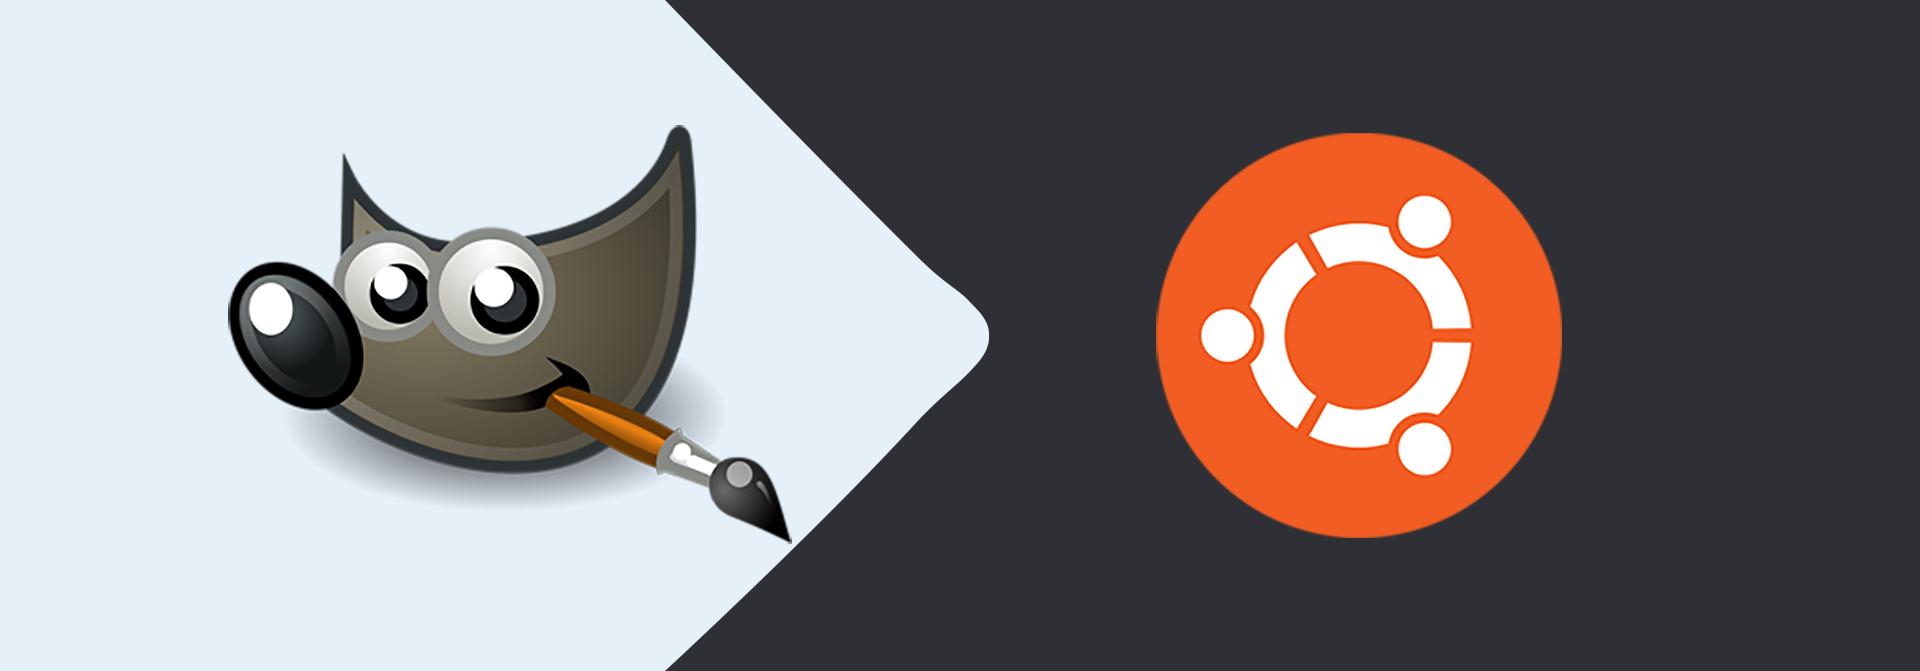 How To Install GIMP On Ubuntu 20.04 LTS